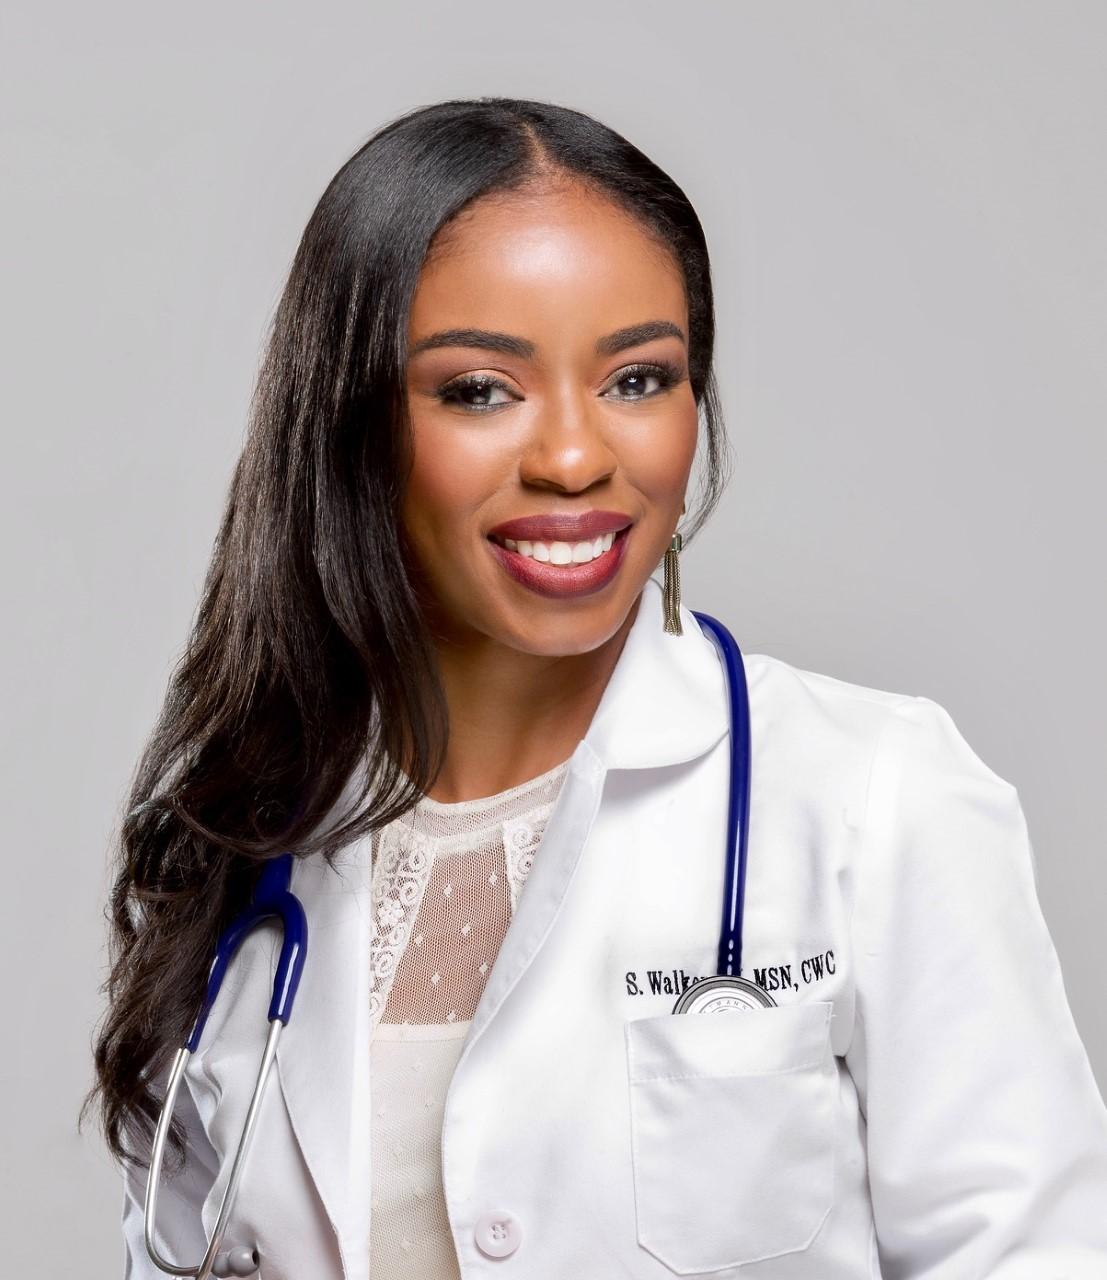 Santisha Walker, RN, MSN, CWC - over 6 years - Walker Group Health & Wellness